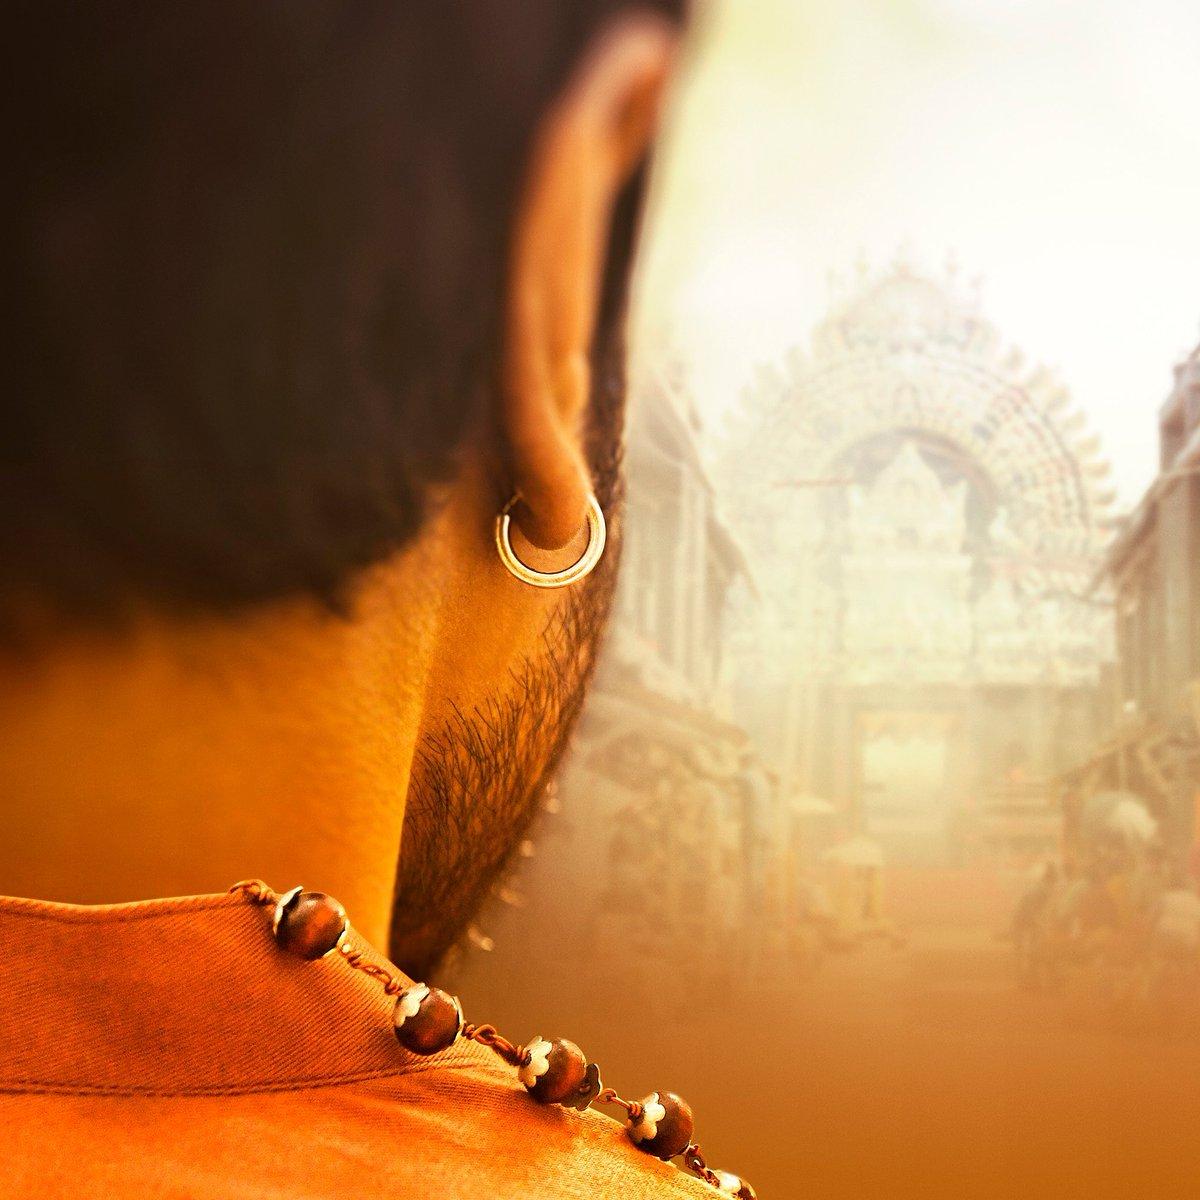 Replying to @RamCharanUni: SIDDHA :- ఆచార్య కోసం  సిద్ధాంతలను పక్కన పెట్టి మరి కొడతా  😎🤙 #MANOFMASSESJoinsTheBOSS #RamCharan